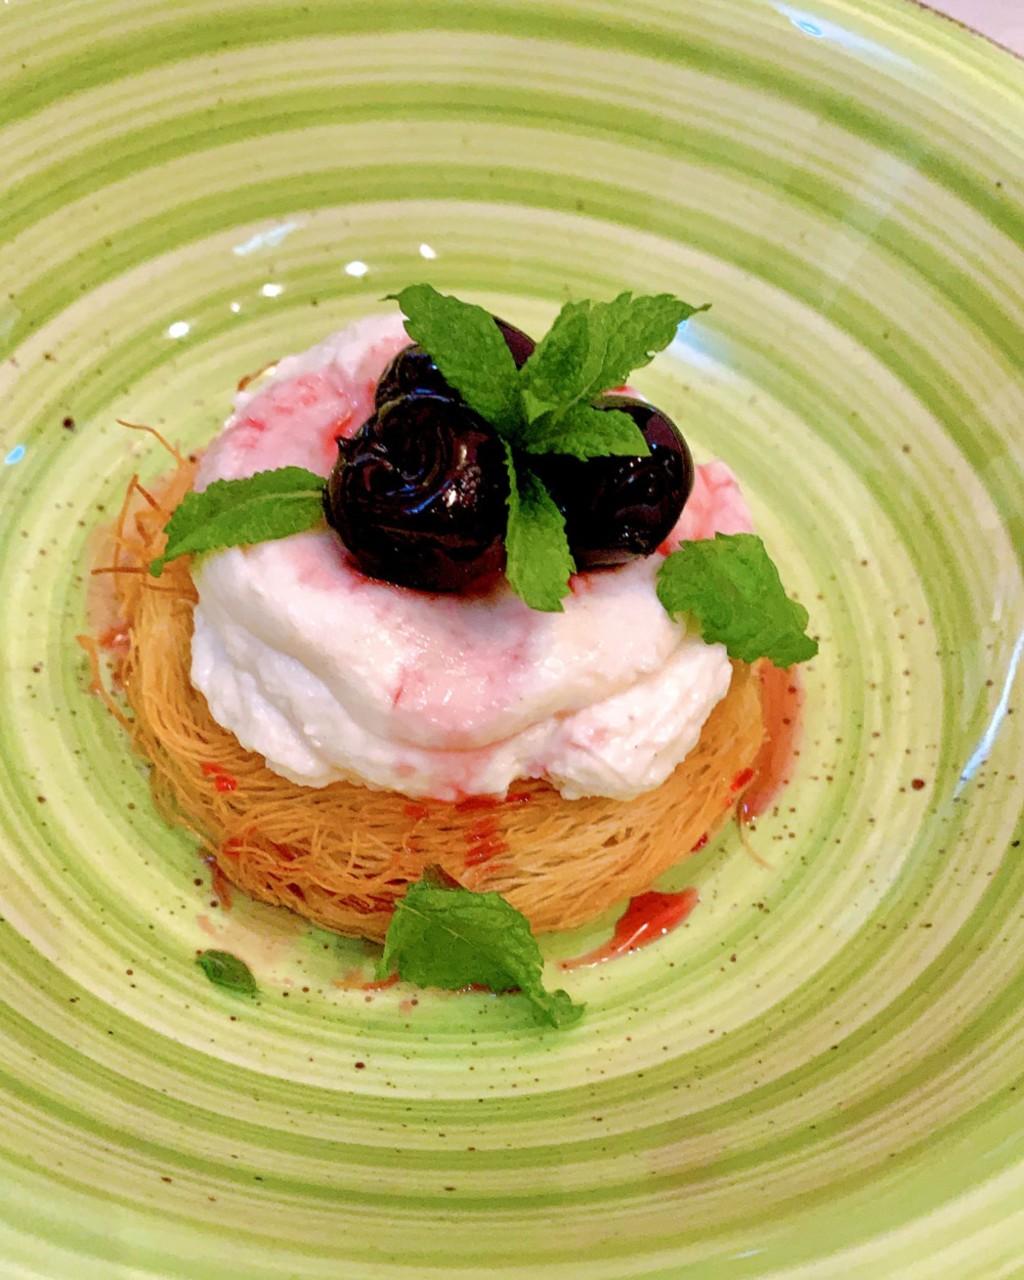 ronzoni-mirko-intervista-food-lifestyle